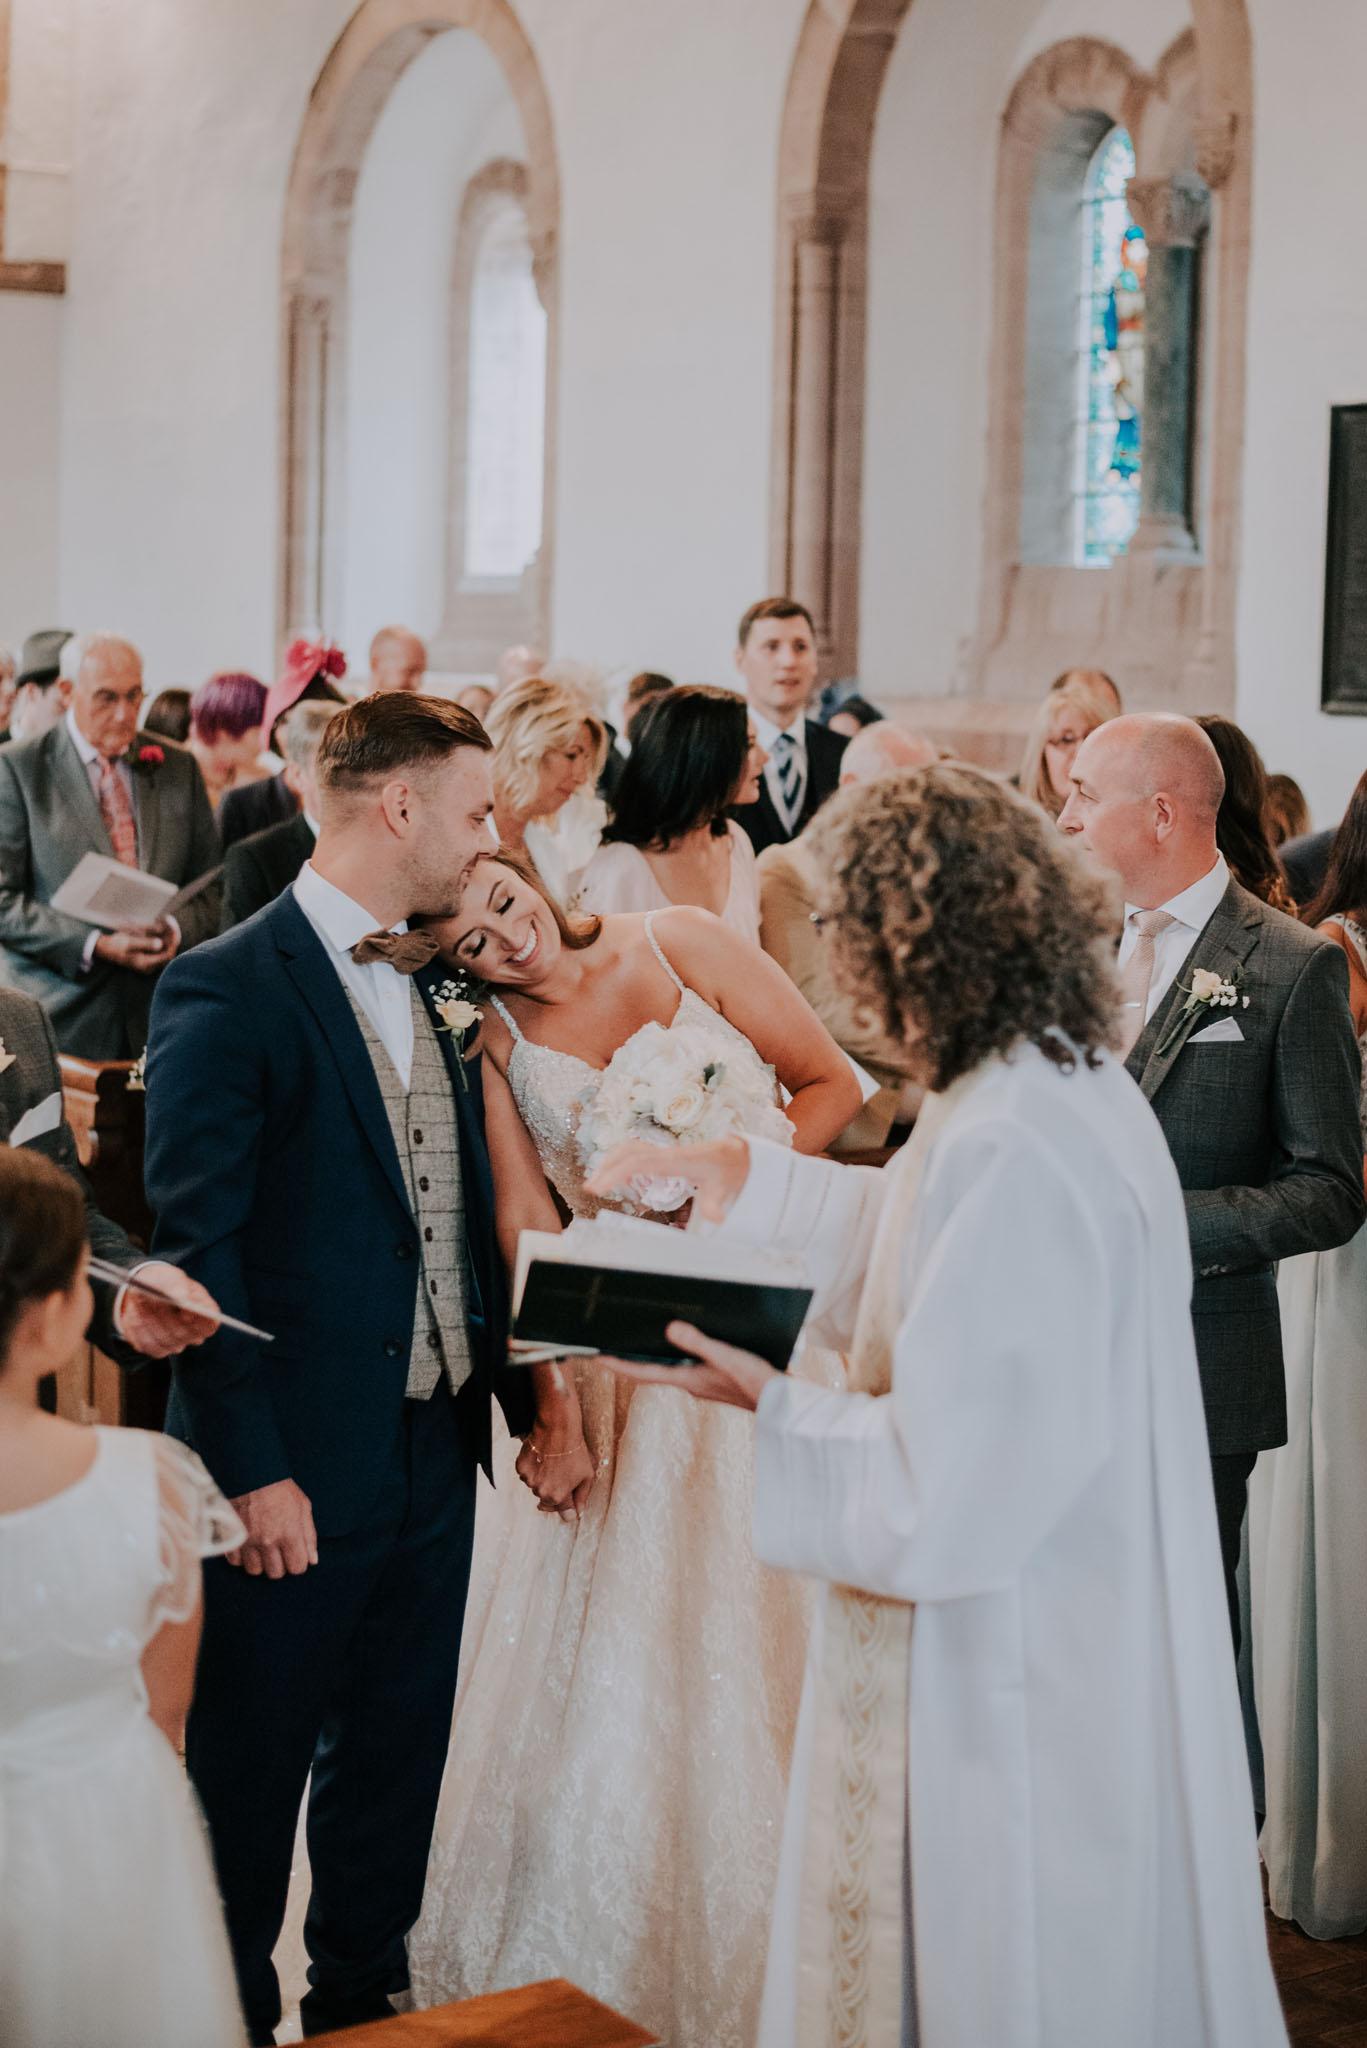 wedding-photographer-glewstone-court-hereford-scott-stockwell-photography173.jpg